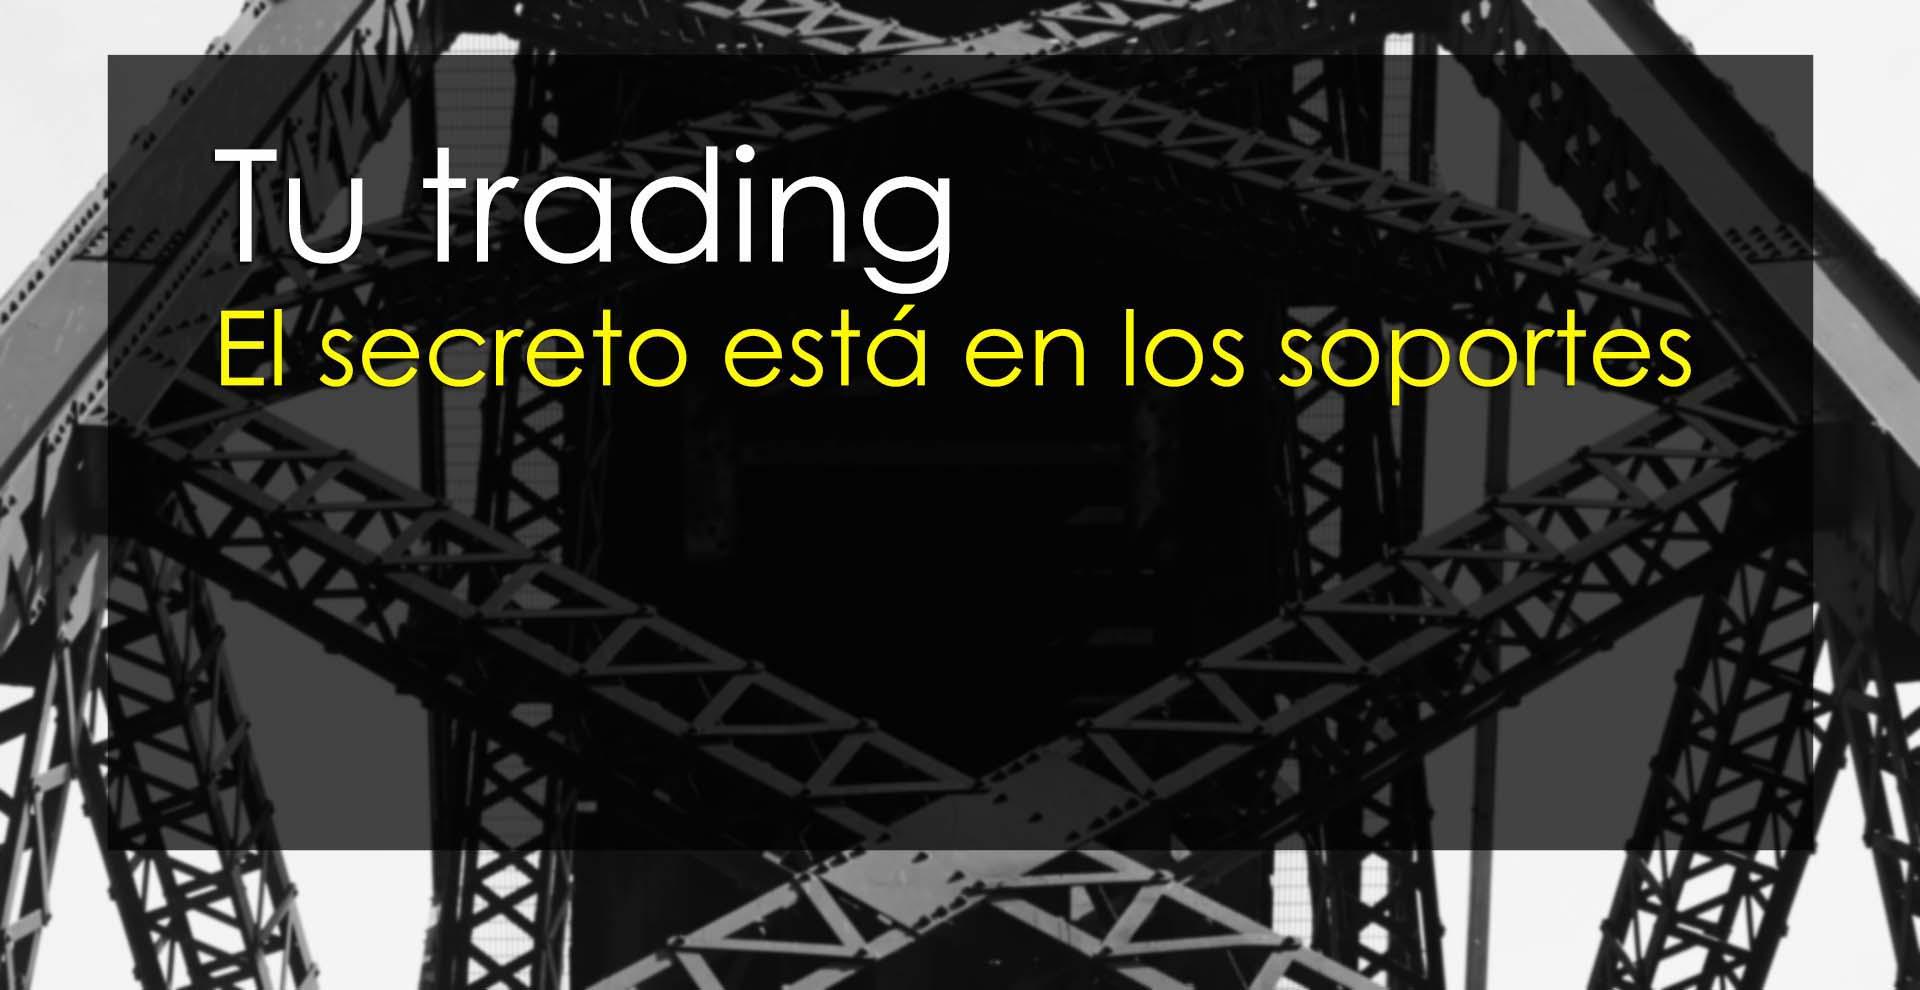 trading soportes